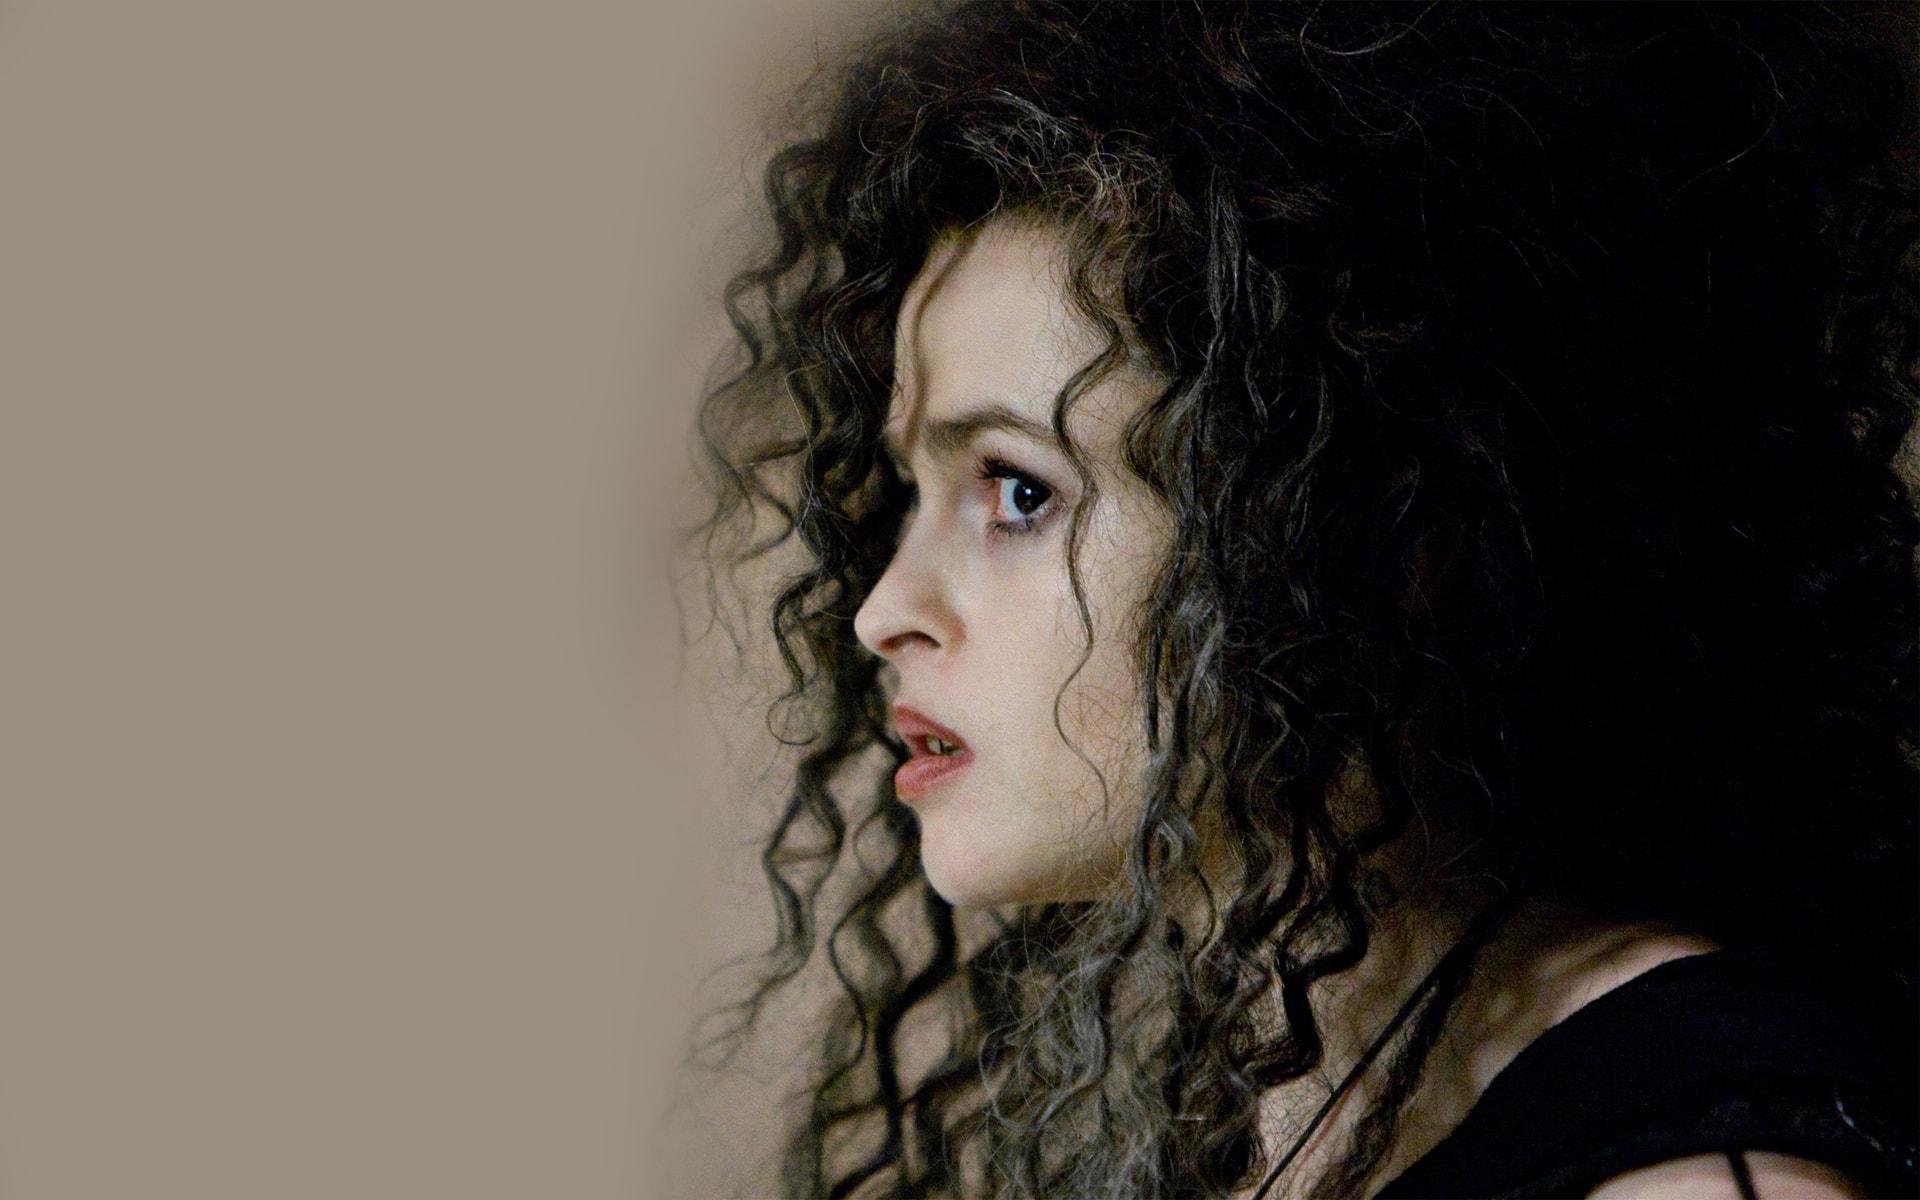 Helena Bonham Carter Wallpapers hd